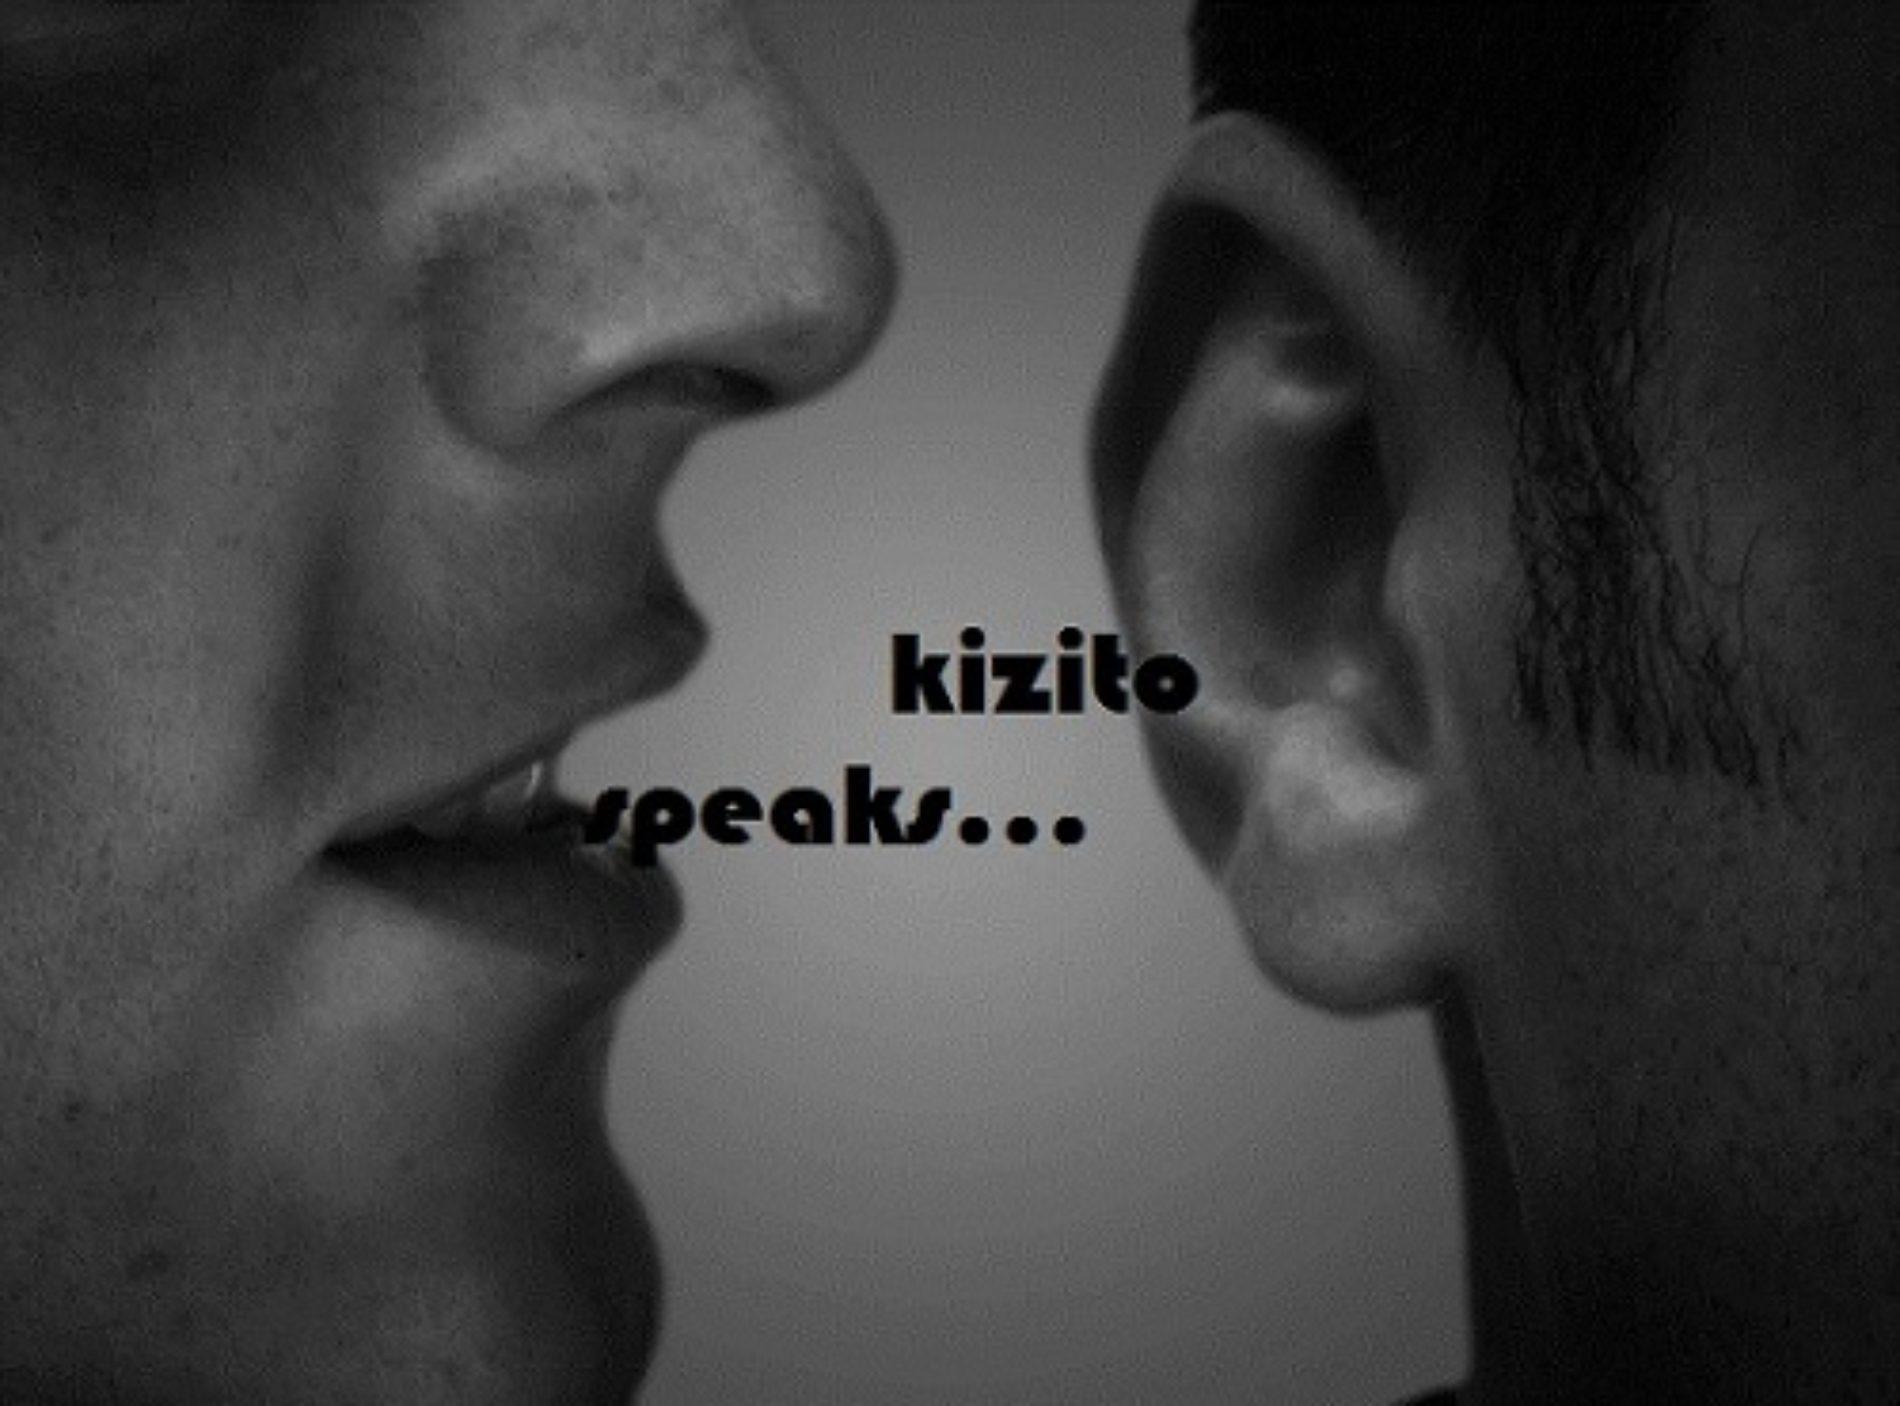 KIZITO SPEAKS II